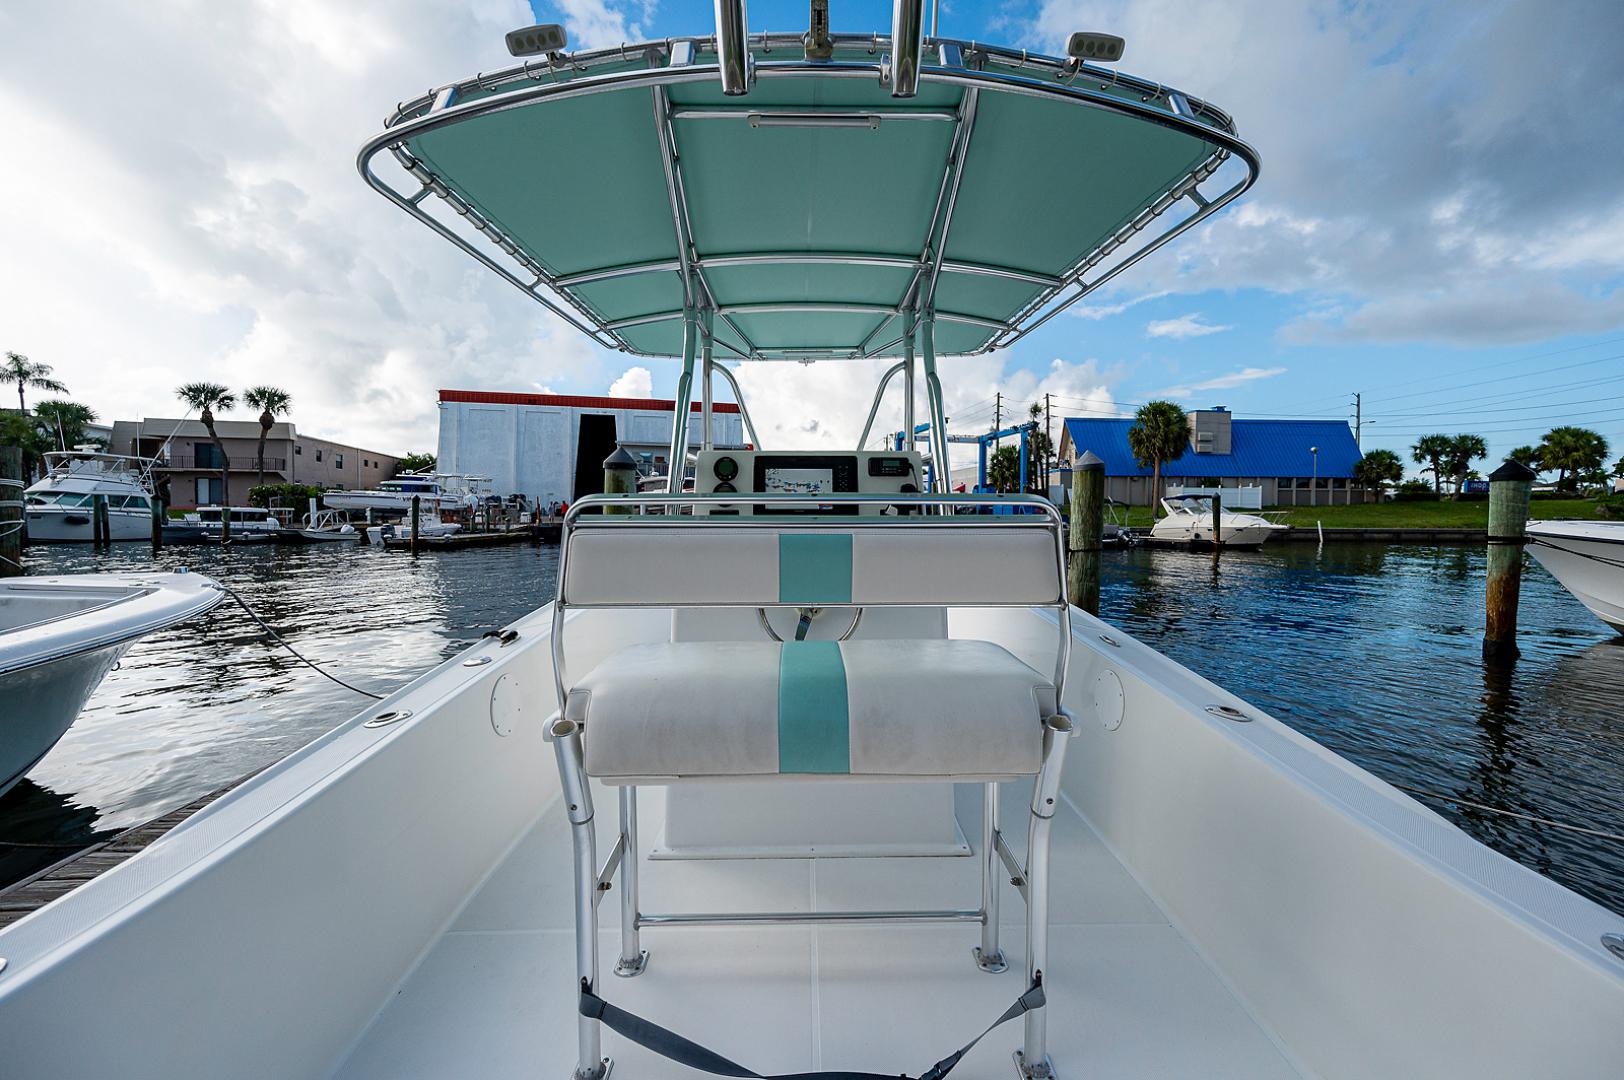 Ocean Master 2013-27 Ocean Master Palm Beach-Florida-United States-Cockpit-1501368 | Thumbnail